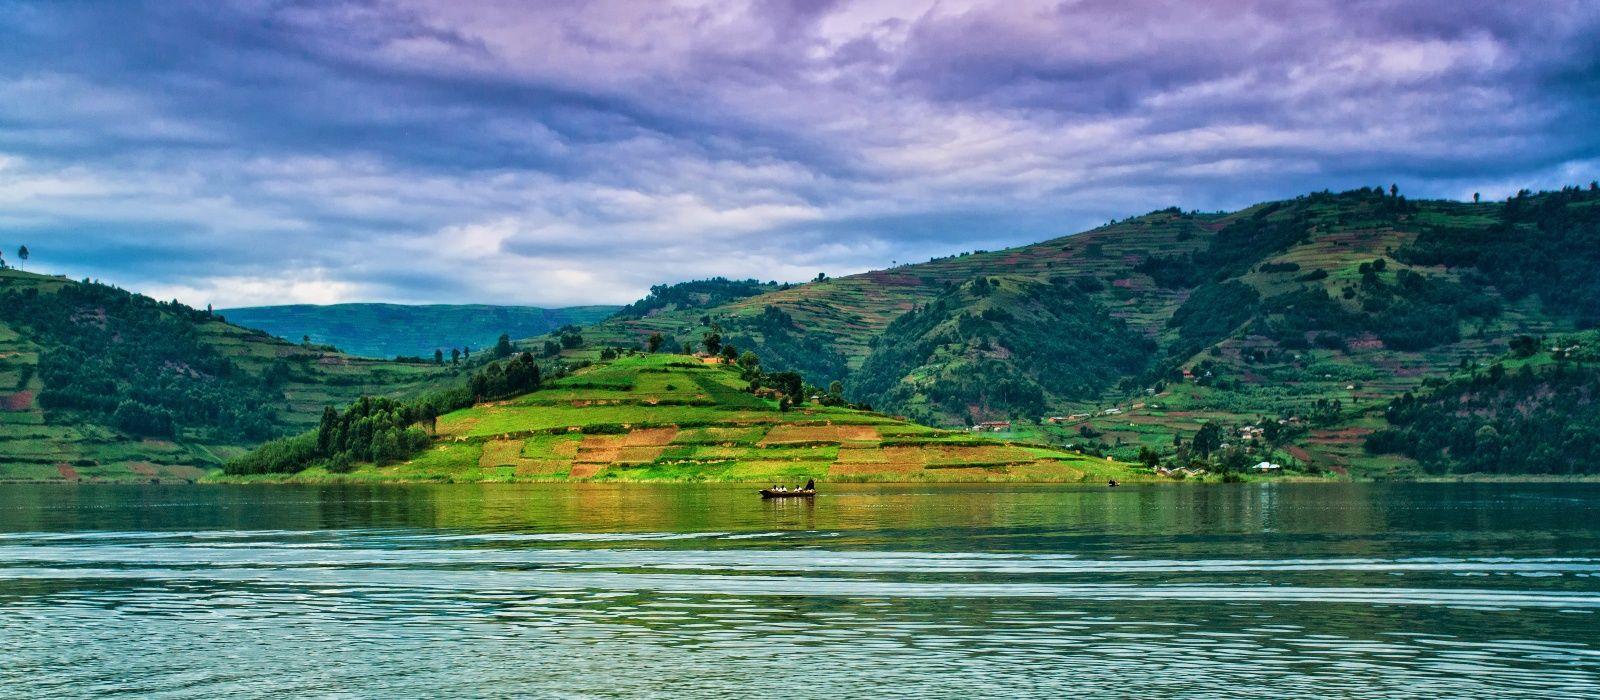 lake Bunyonyi - 14 Days Primates And Big Five Safari - The Best Long Uganda Wildlife Safari